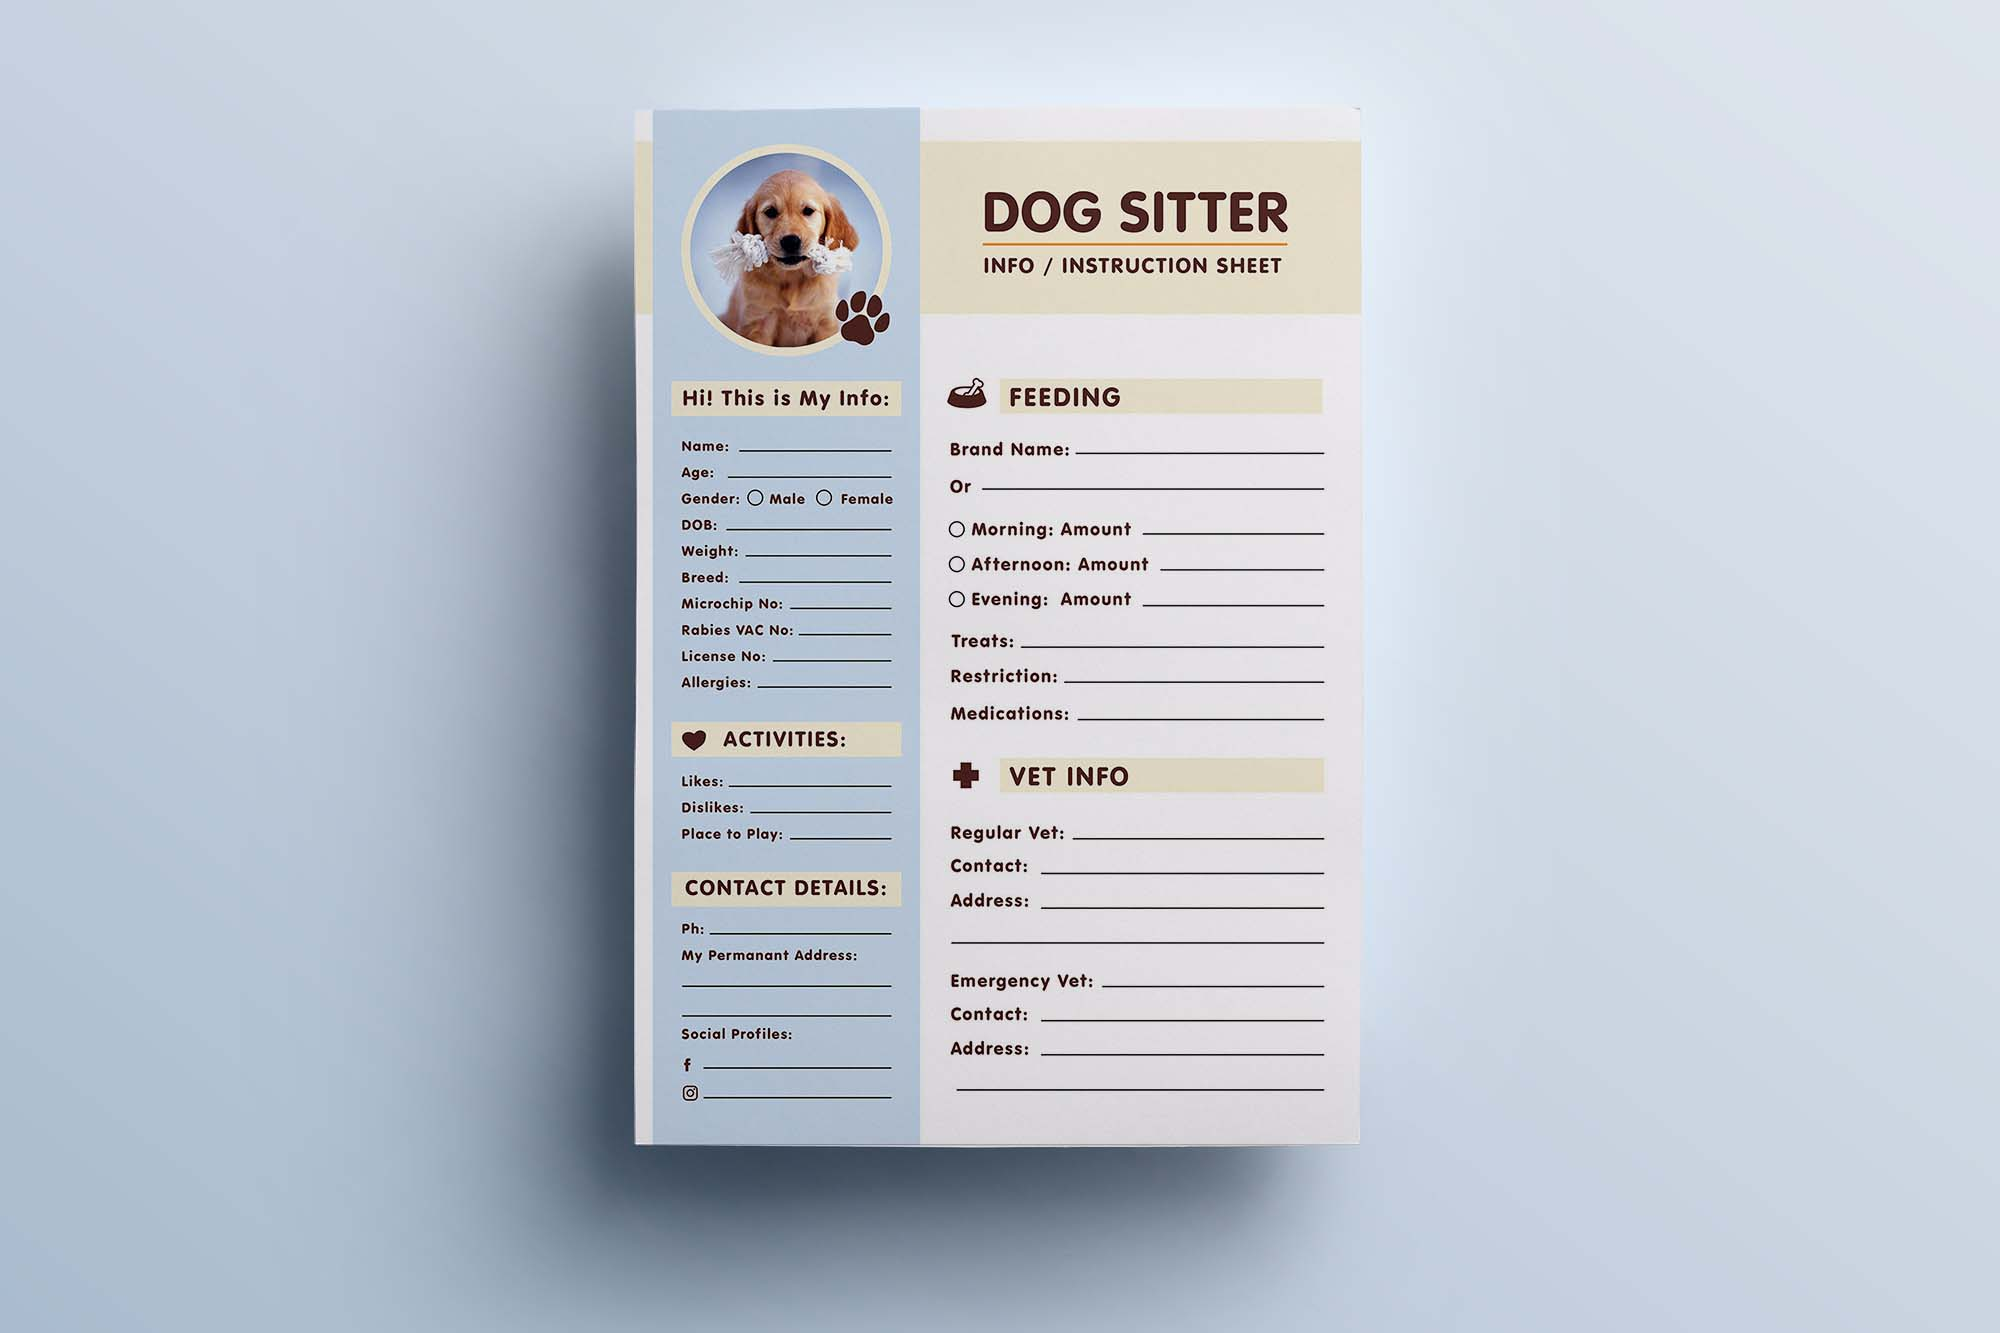 Dog Sitter Information Sheet Template